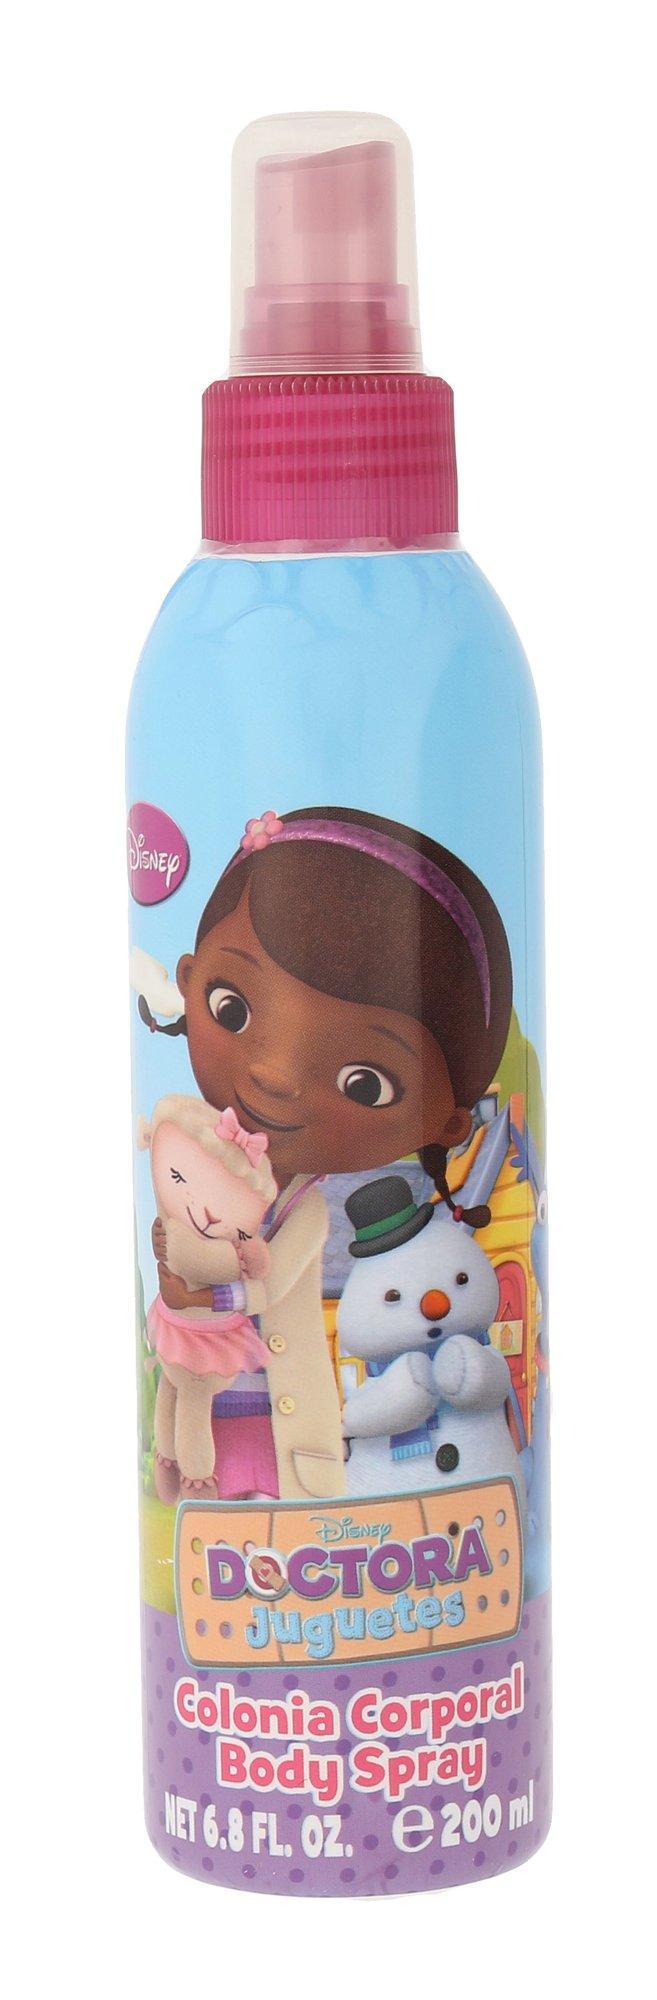 Disney Doctora Juguetes Tělový spray 200ml